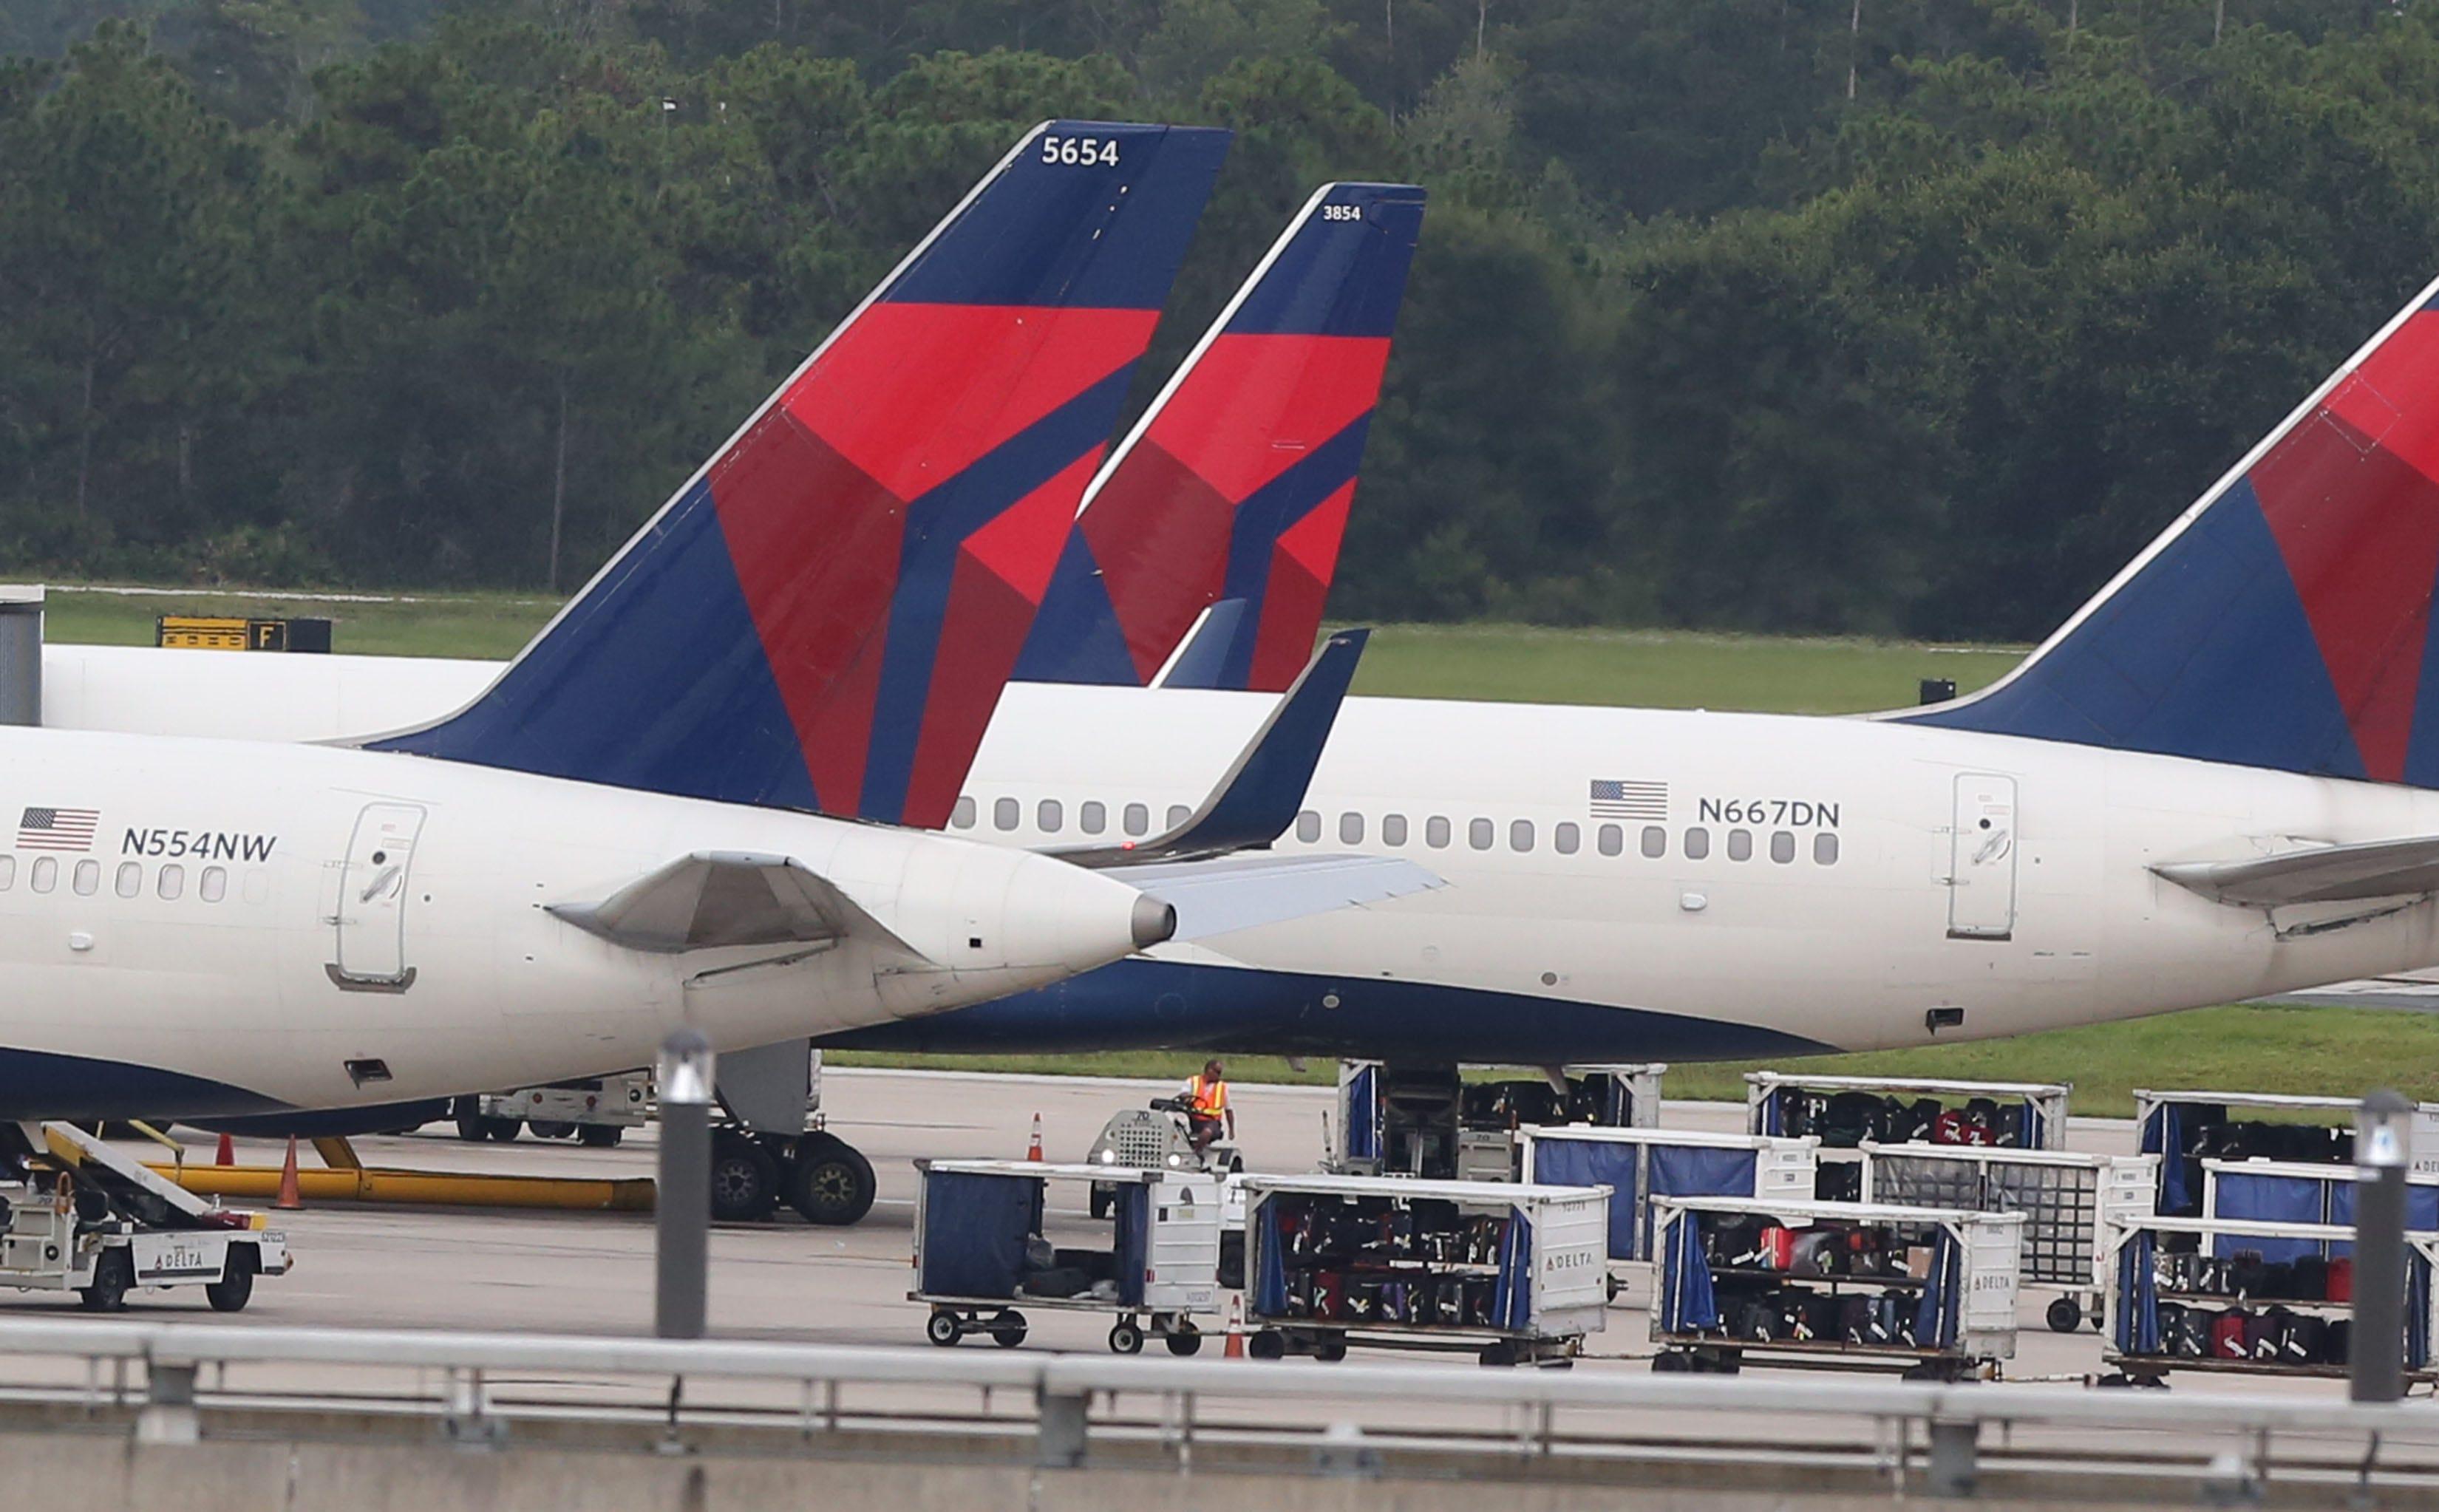 Delta offering more trans-Atlantic flights from non-hub cities in U.S.